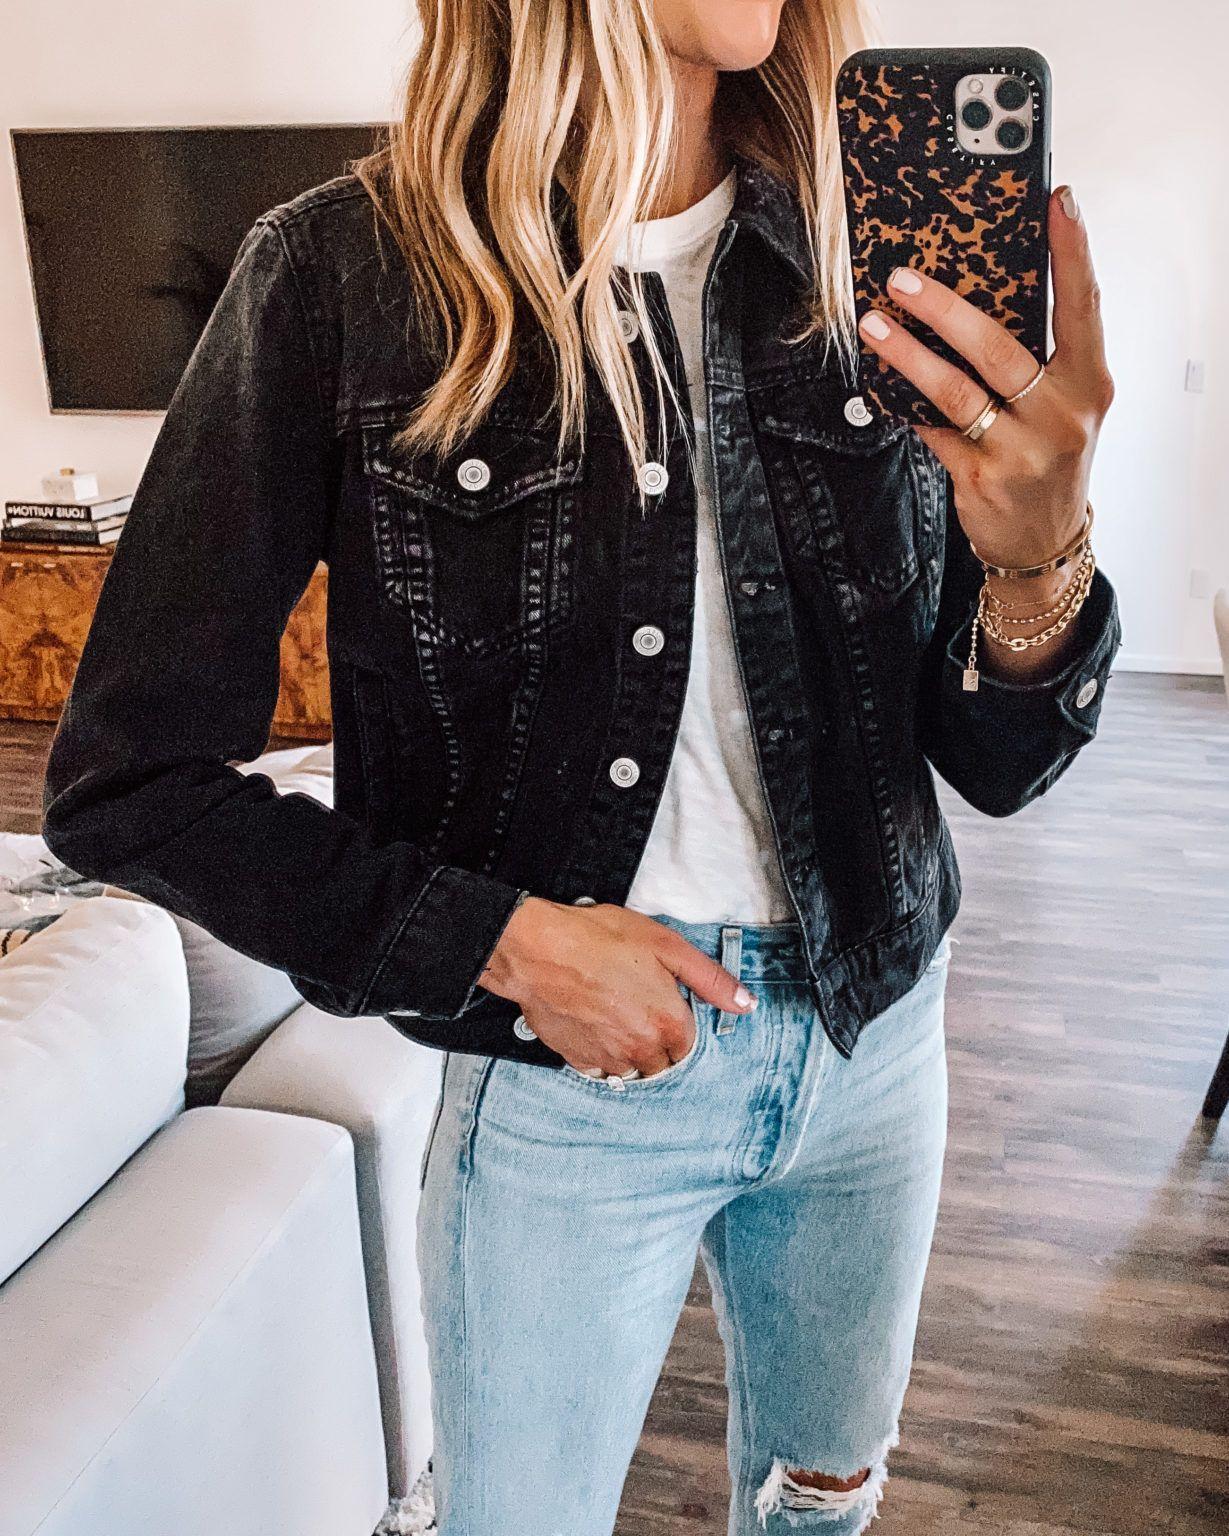 Fashion Jackson Wearing Black Denim Jacket White Tshirt Ripped Denim Jeans In 2021 Jacket Outfit Women Black Denim Jacket Outfit Jean Jacket Outfits Summer [ 1536 x 1229 Pixel ]